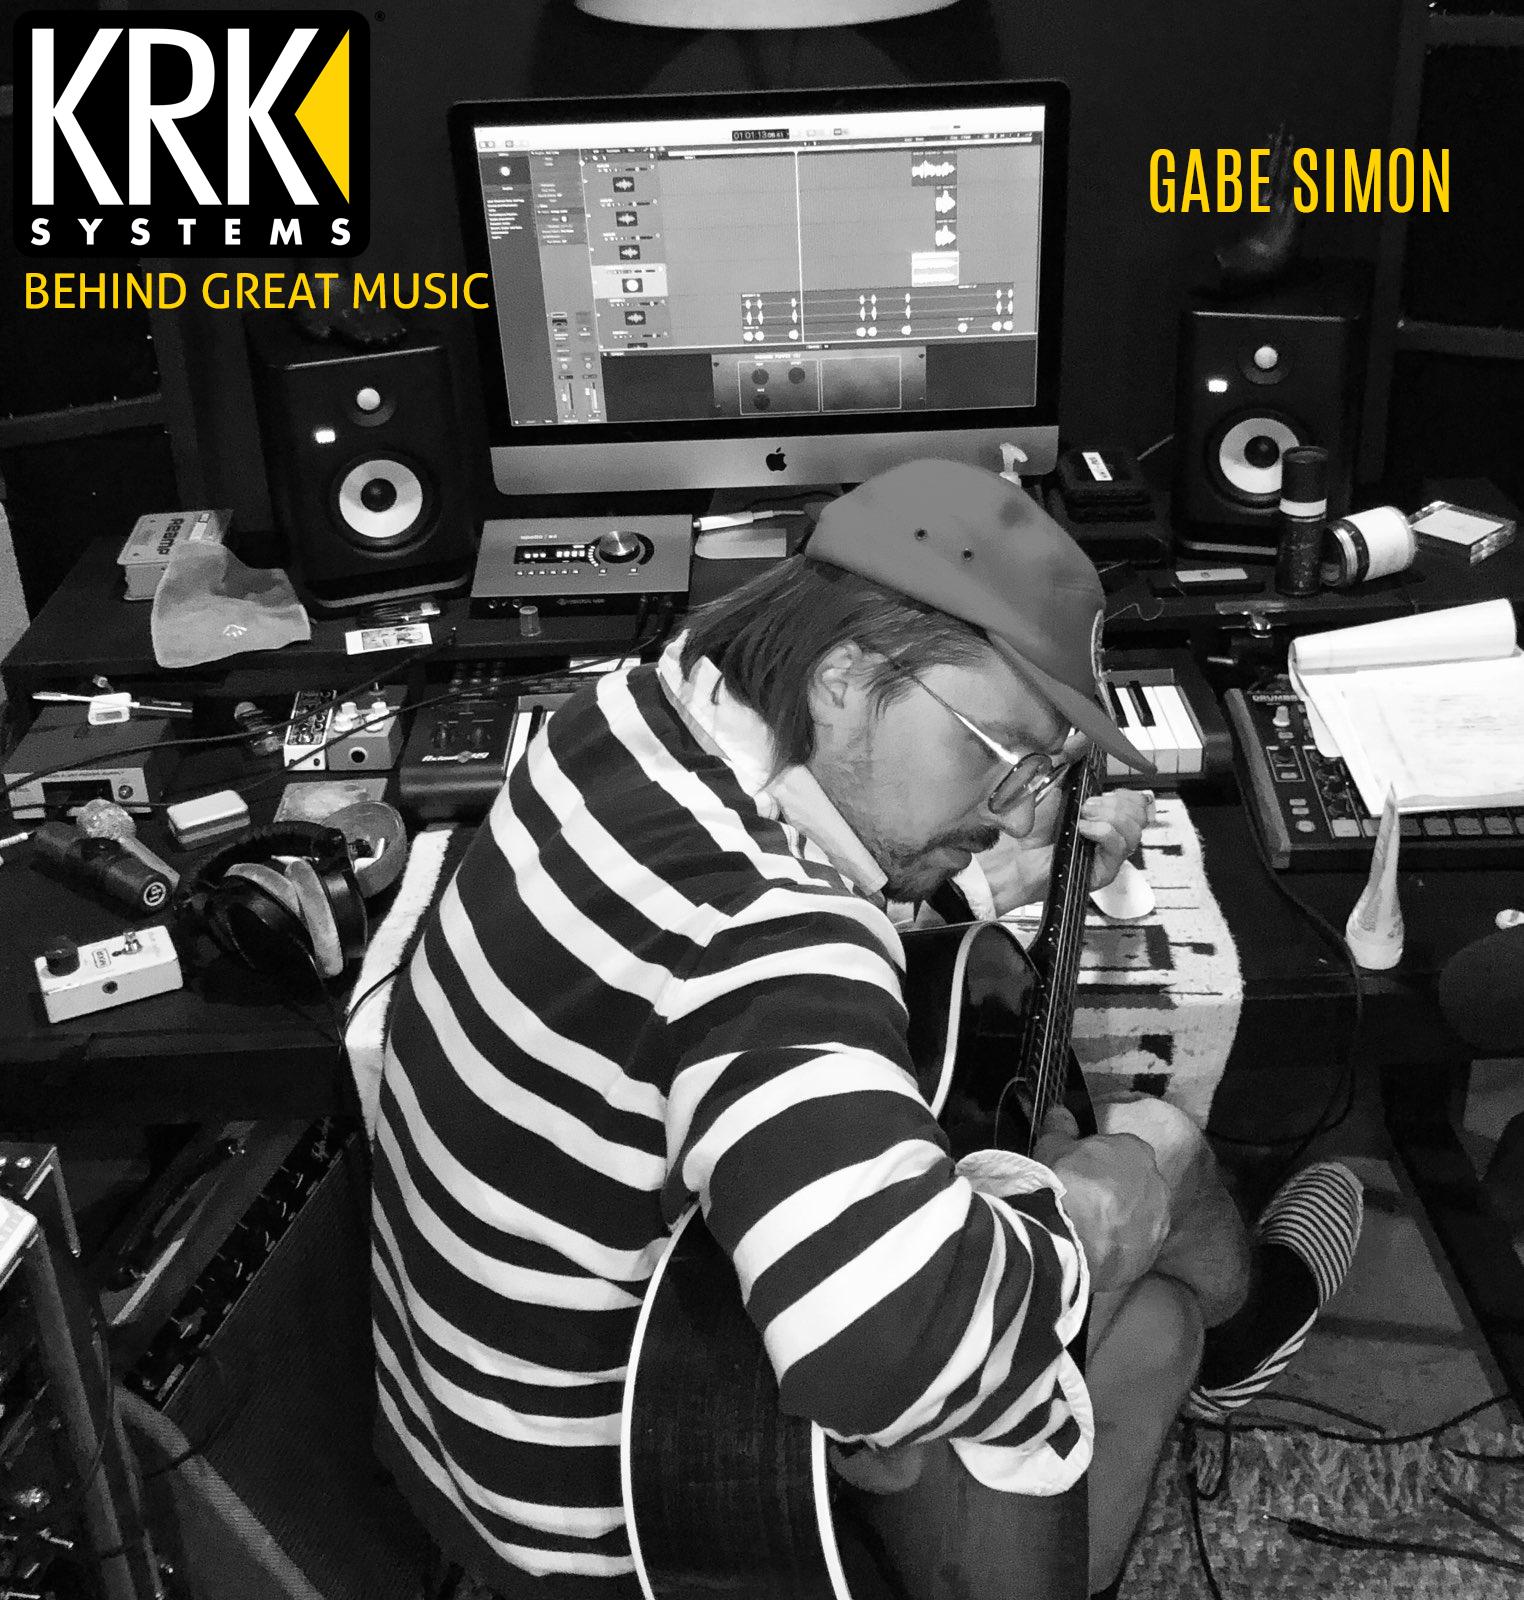 Gabe Simon KRK 1